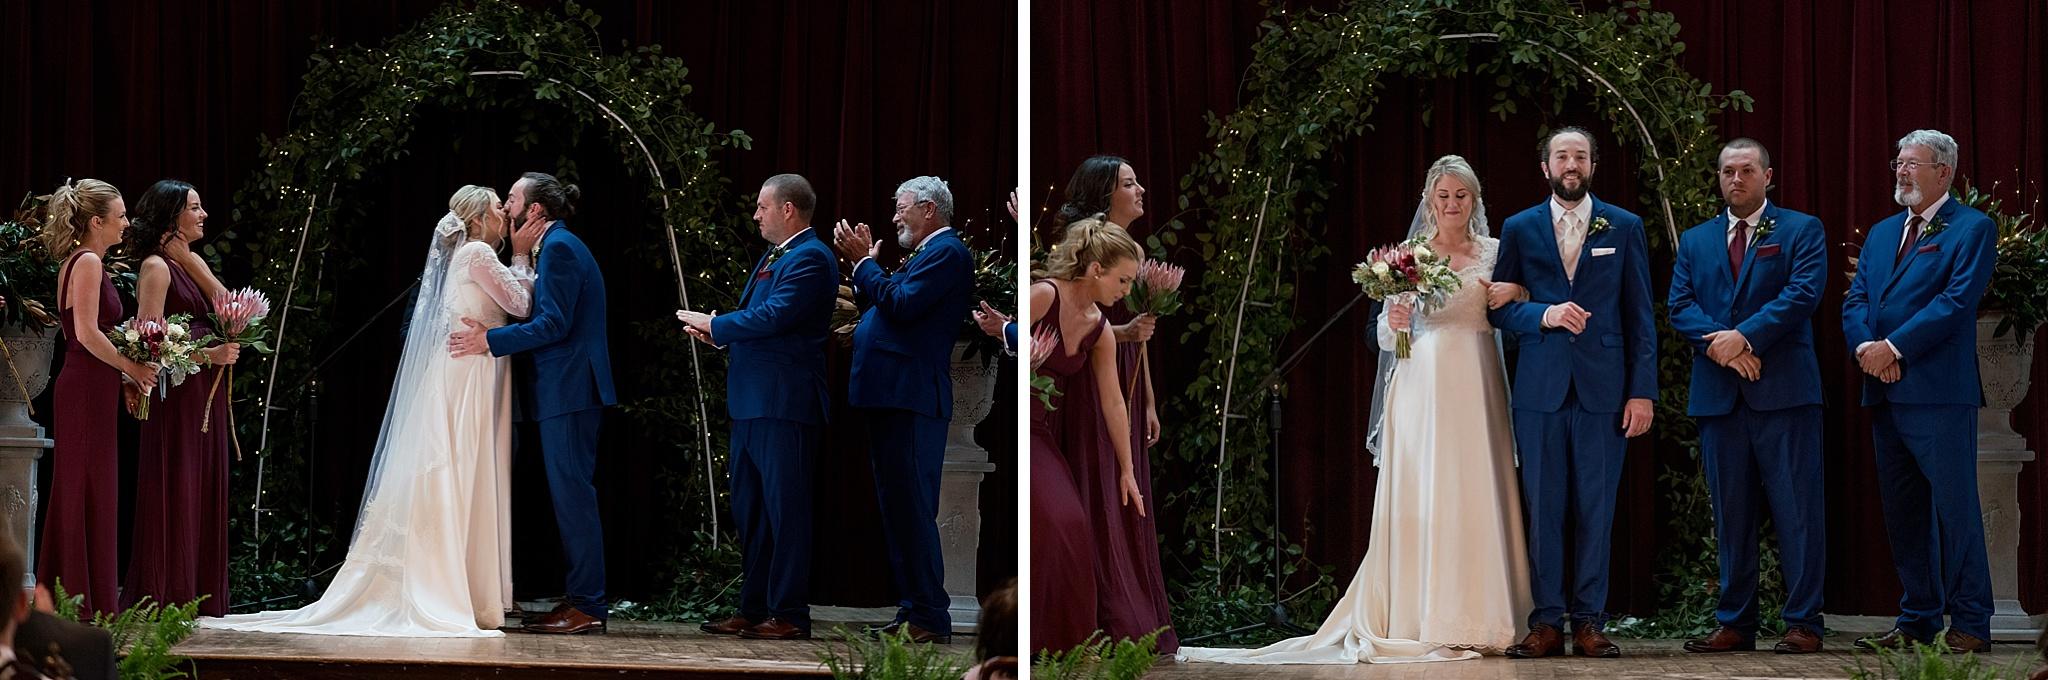 Washington-NC-Wedding-Photography-184.jpg